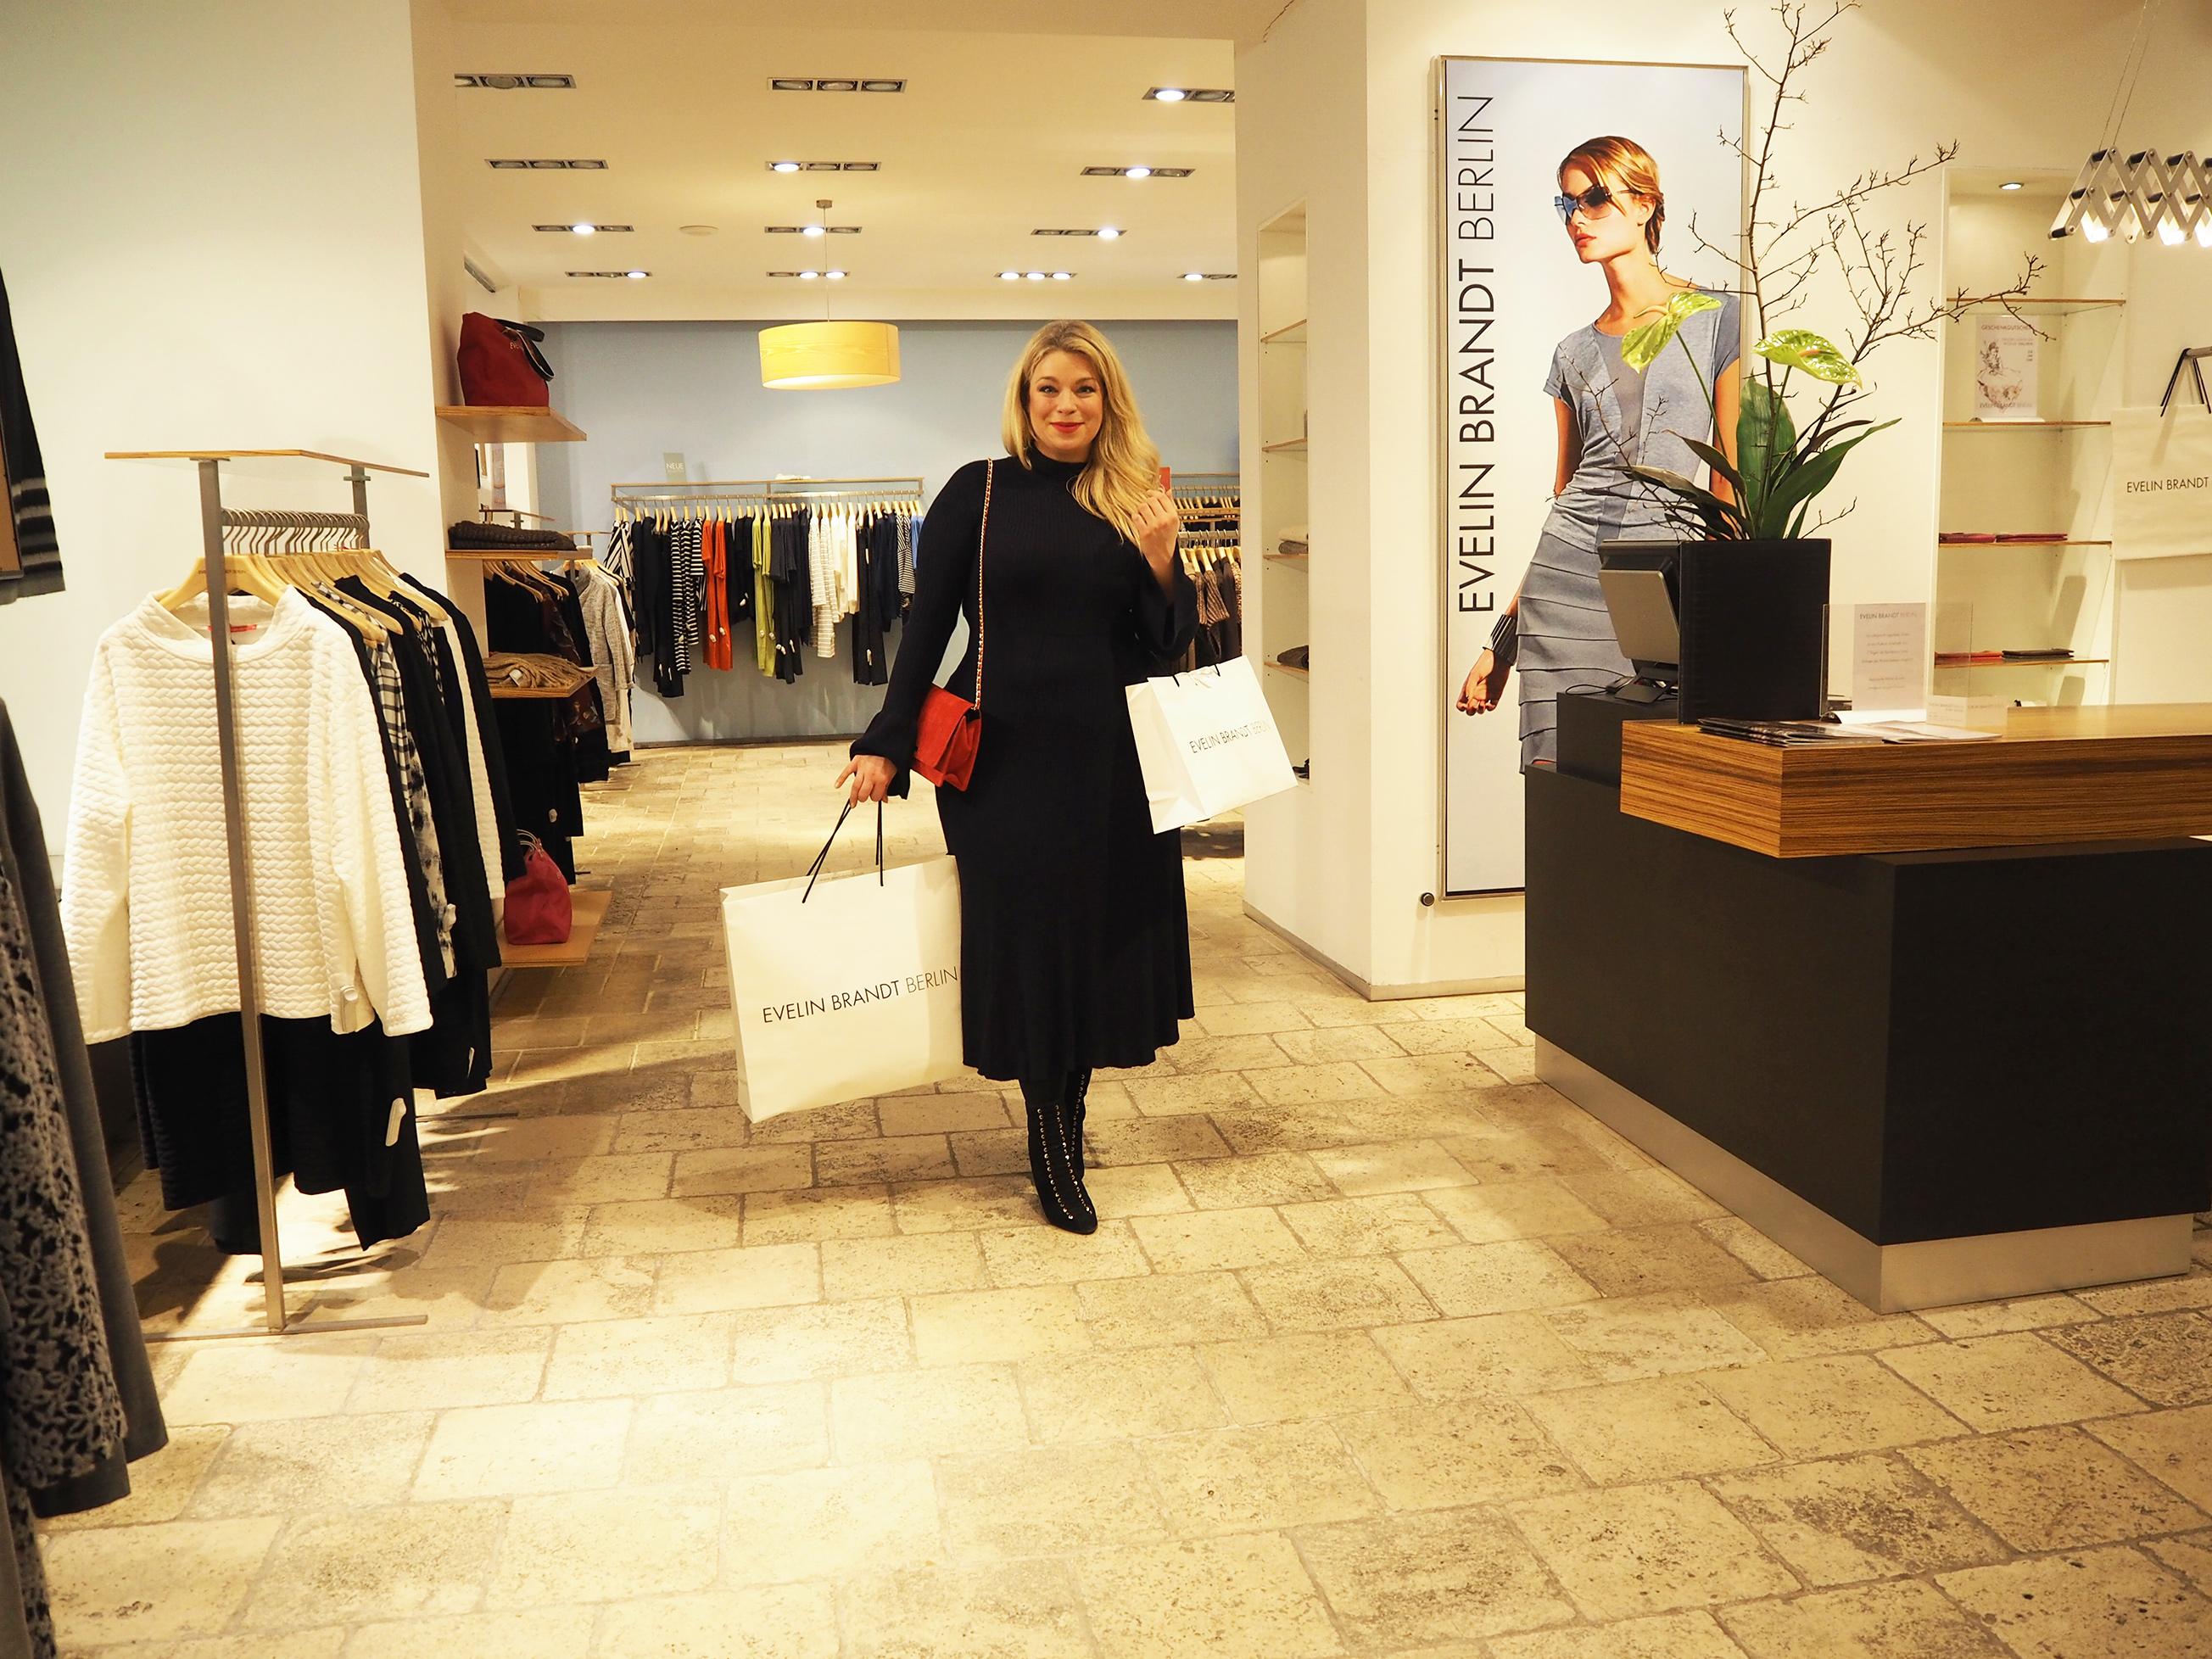 Caterina-Megabambi-Pogorzelski-Shoppingguide-berlin